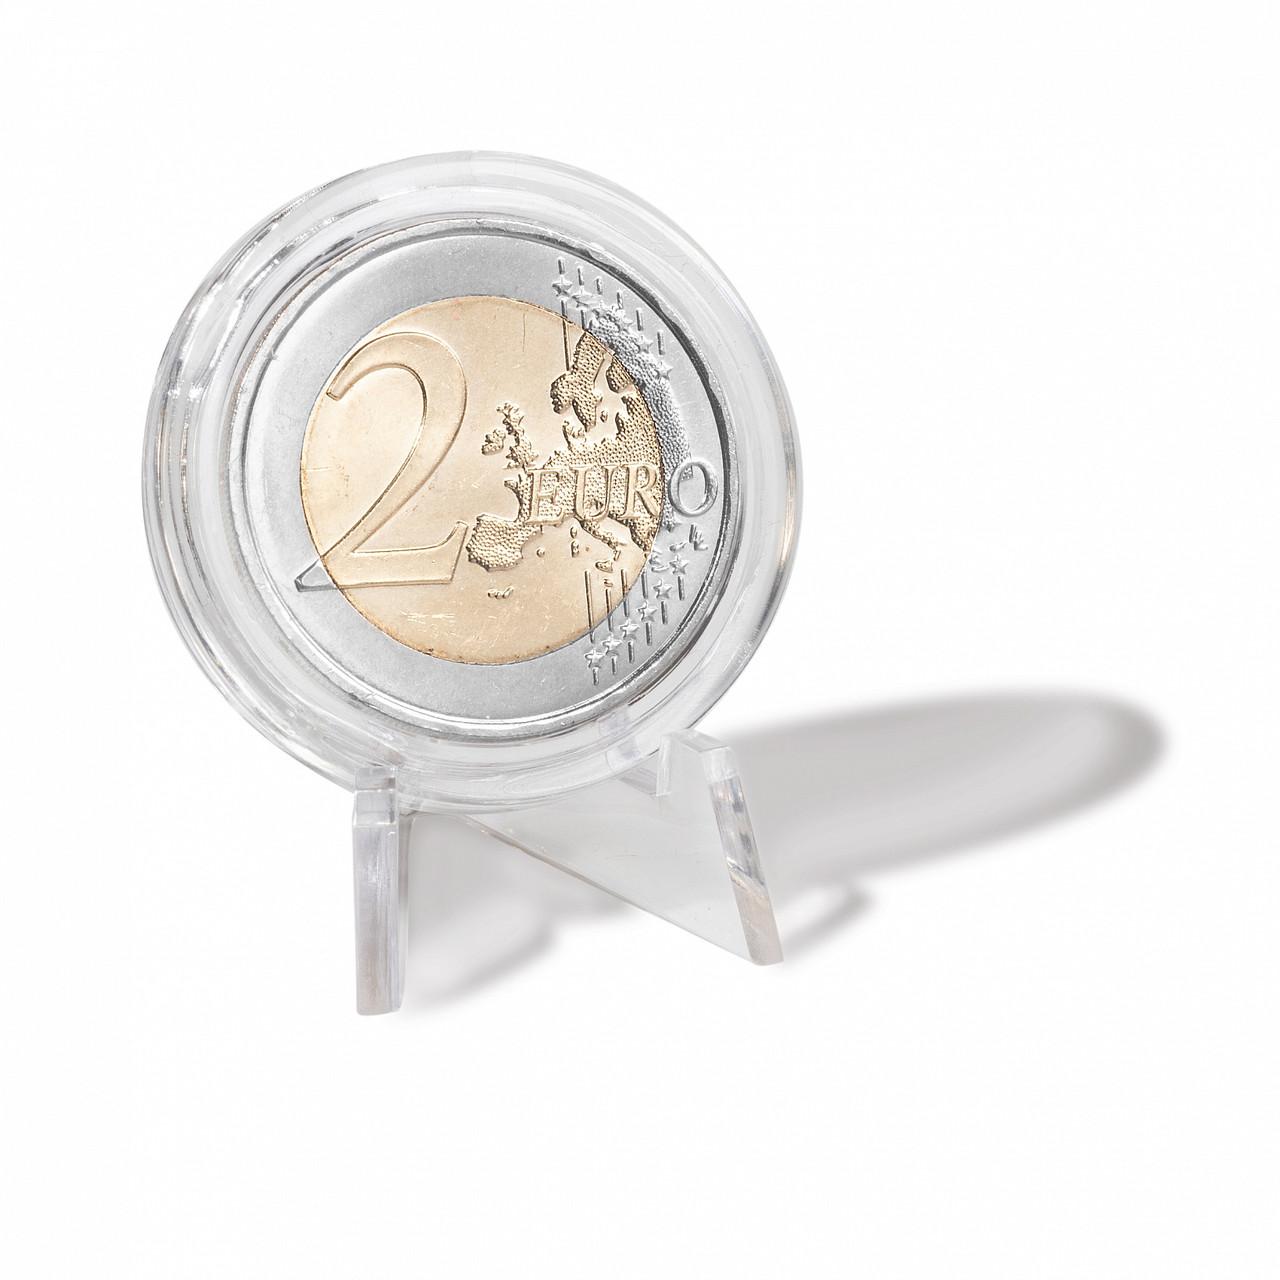 Тримач для монет, монетних капсул, медалей 26*21 мм